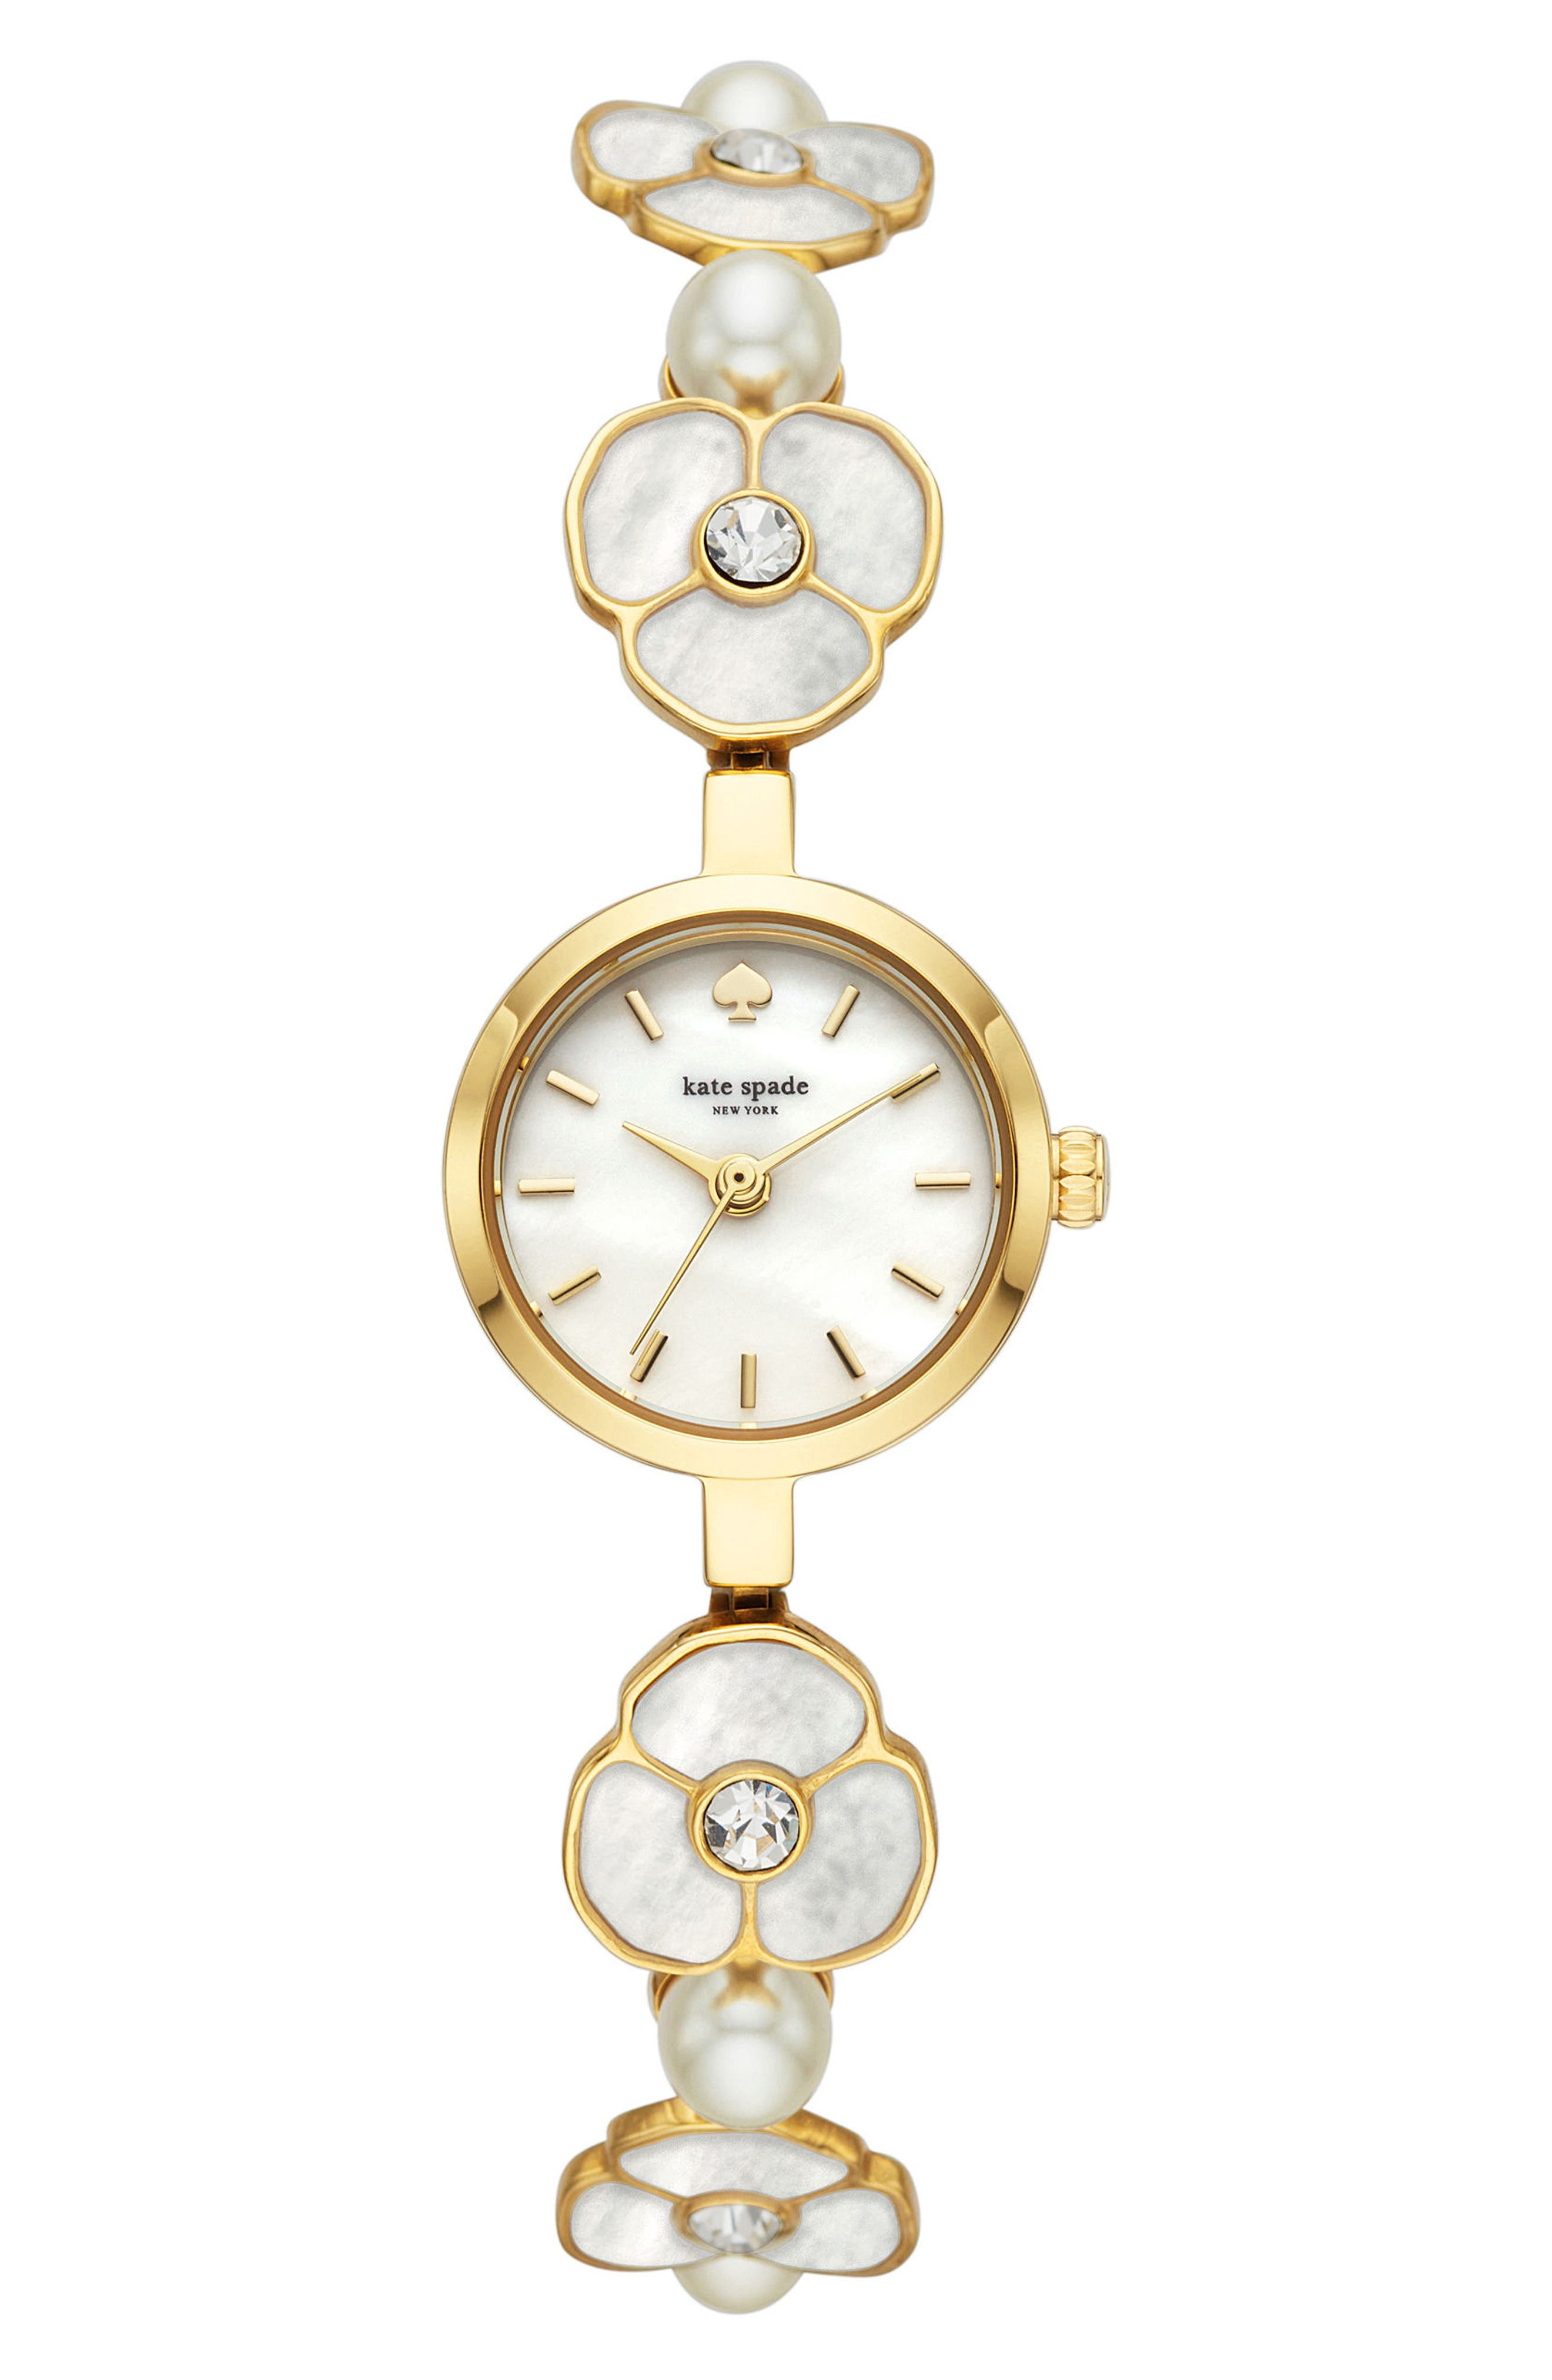 kate spade metro bracelet watch, 21mm,                             Main thumbnail 1, color,                             GOLD/ MOP/ GOLD